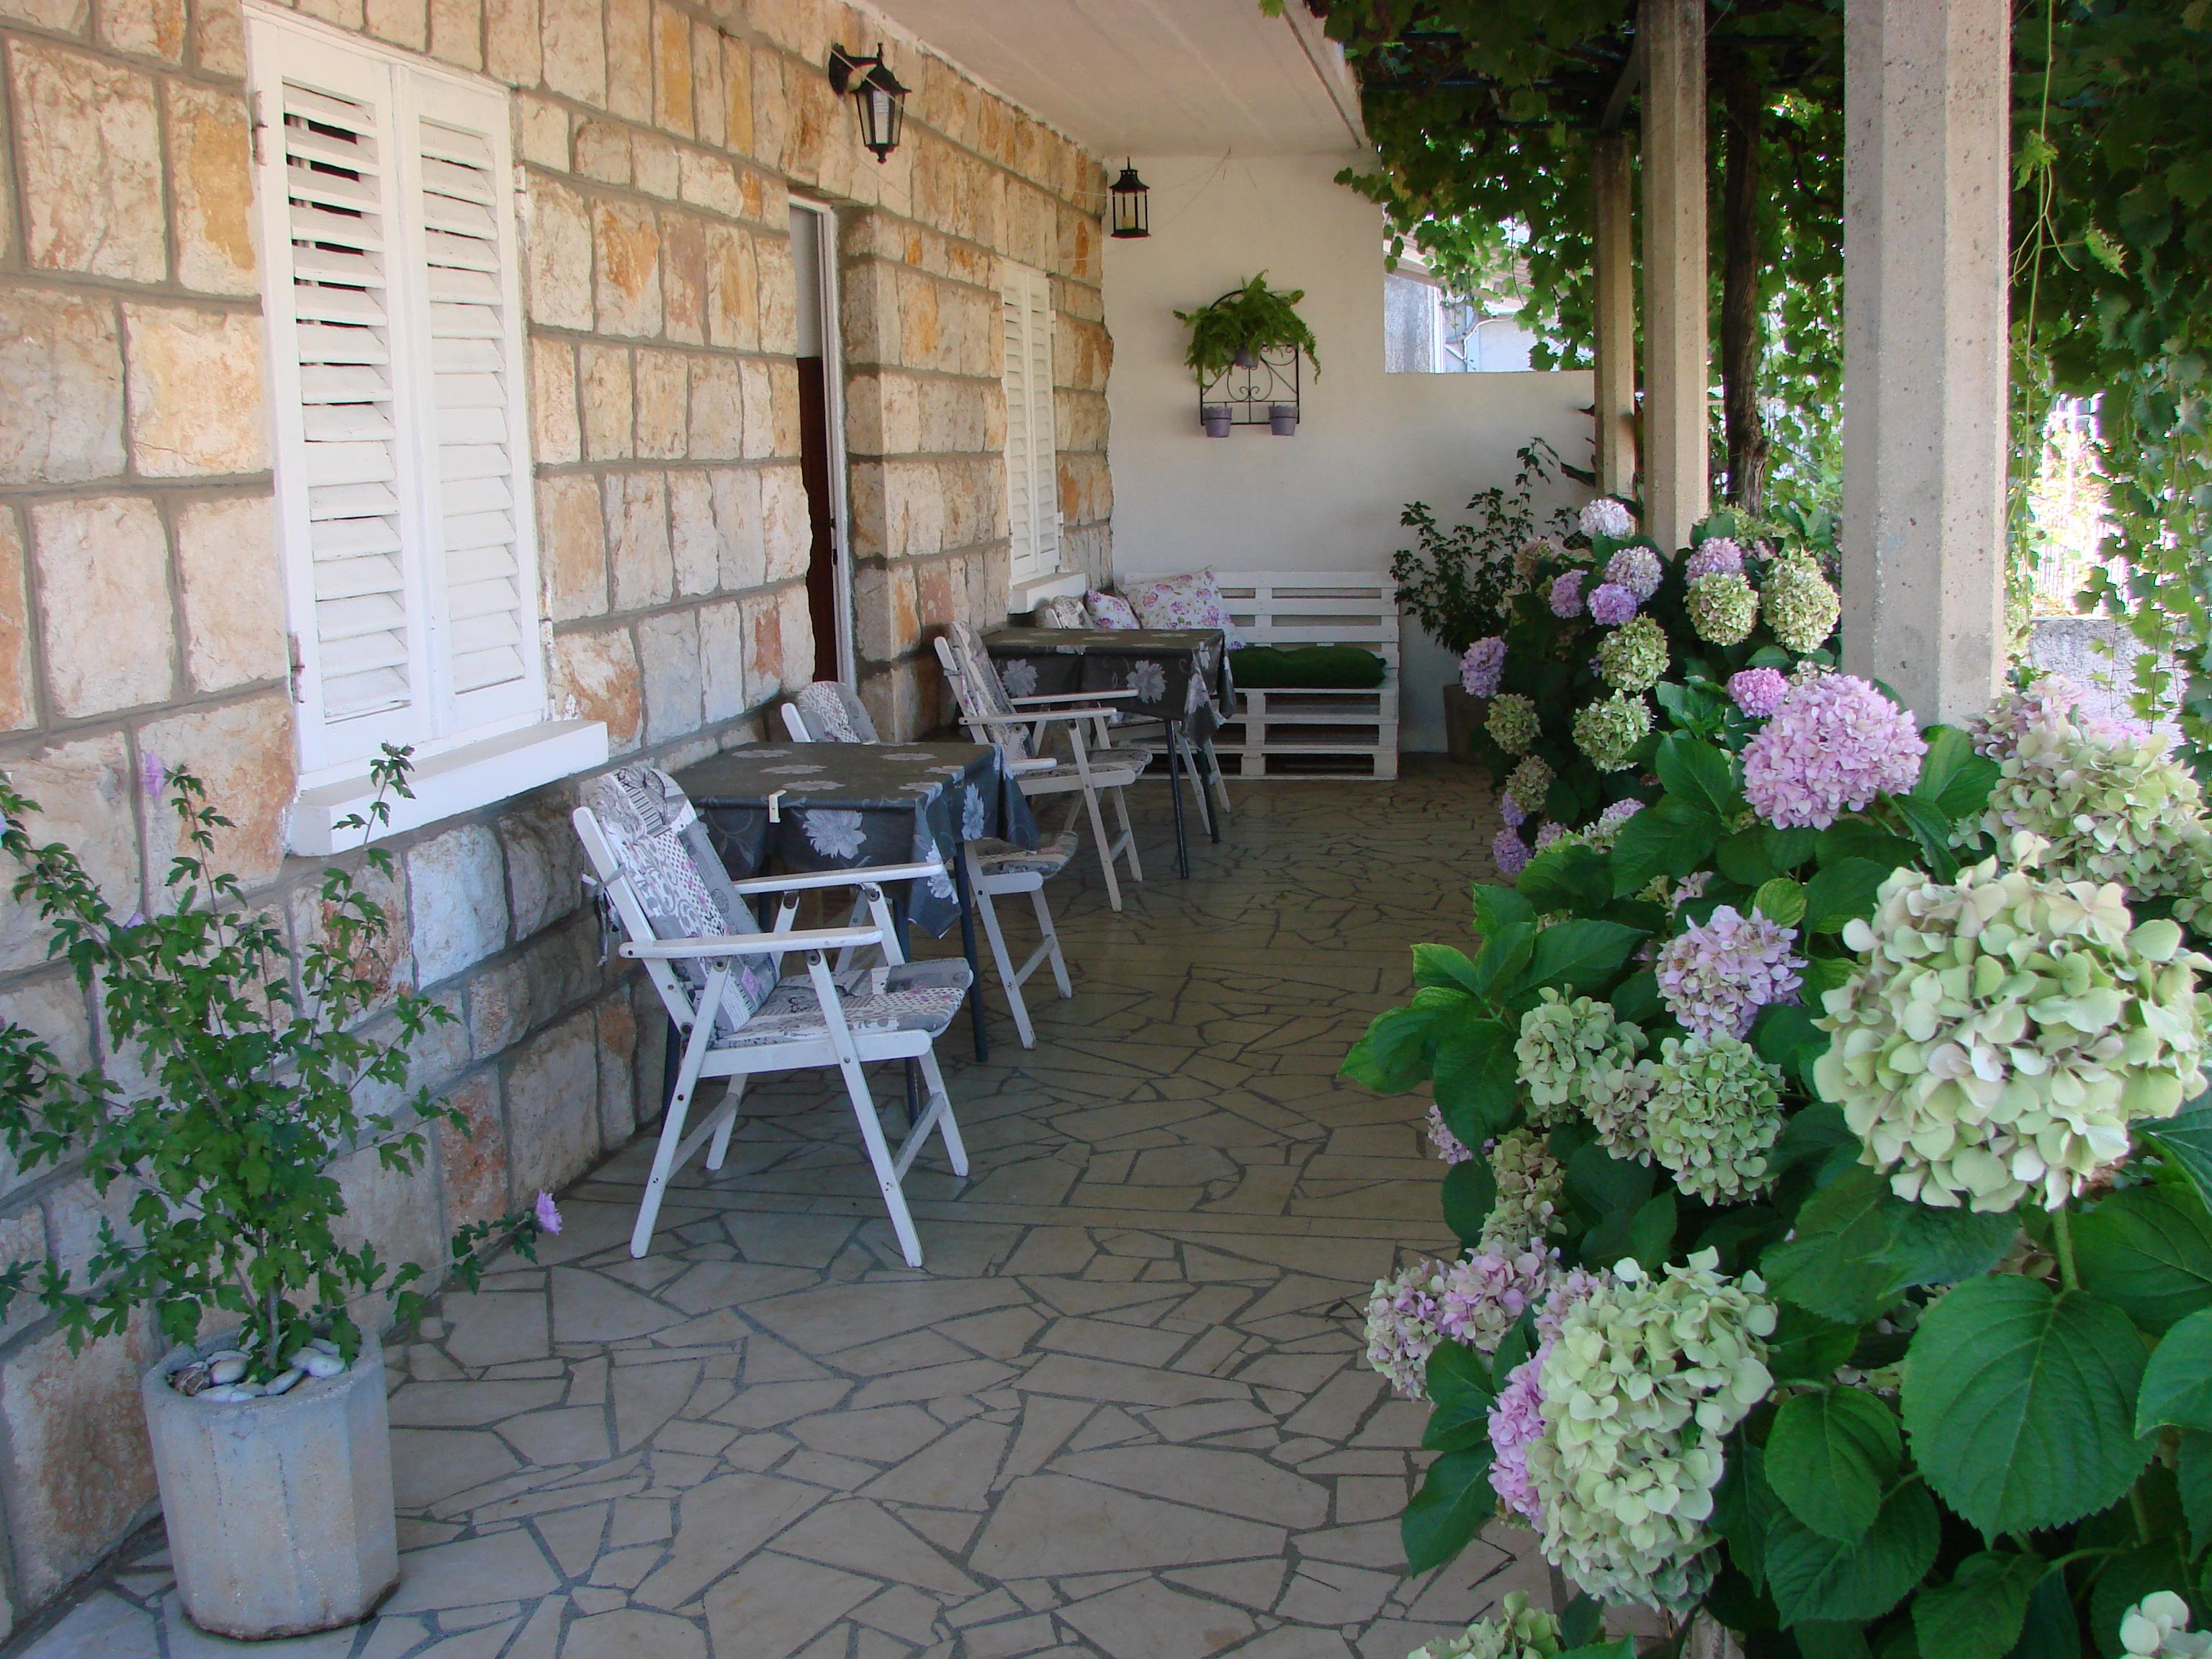 HOSTEL - Hostel Dubrovnik Budget Accommodation